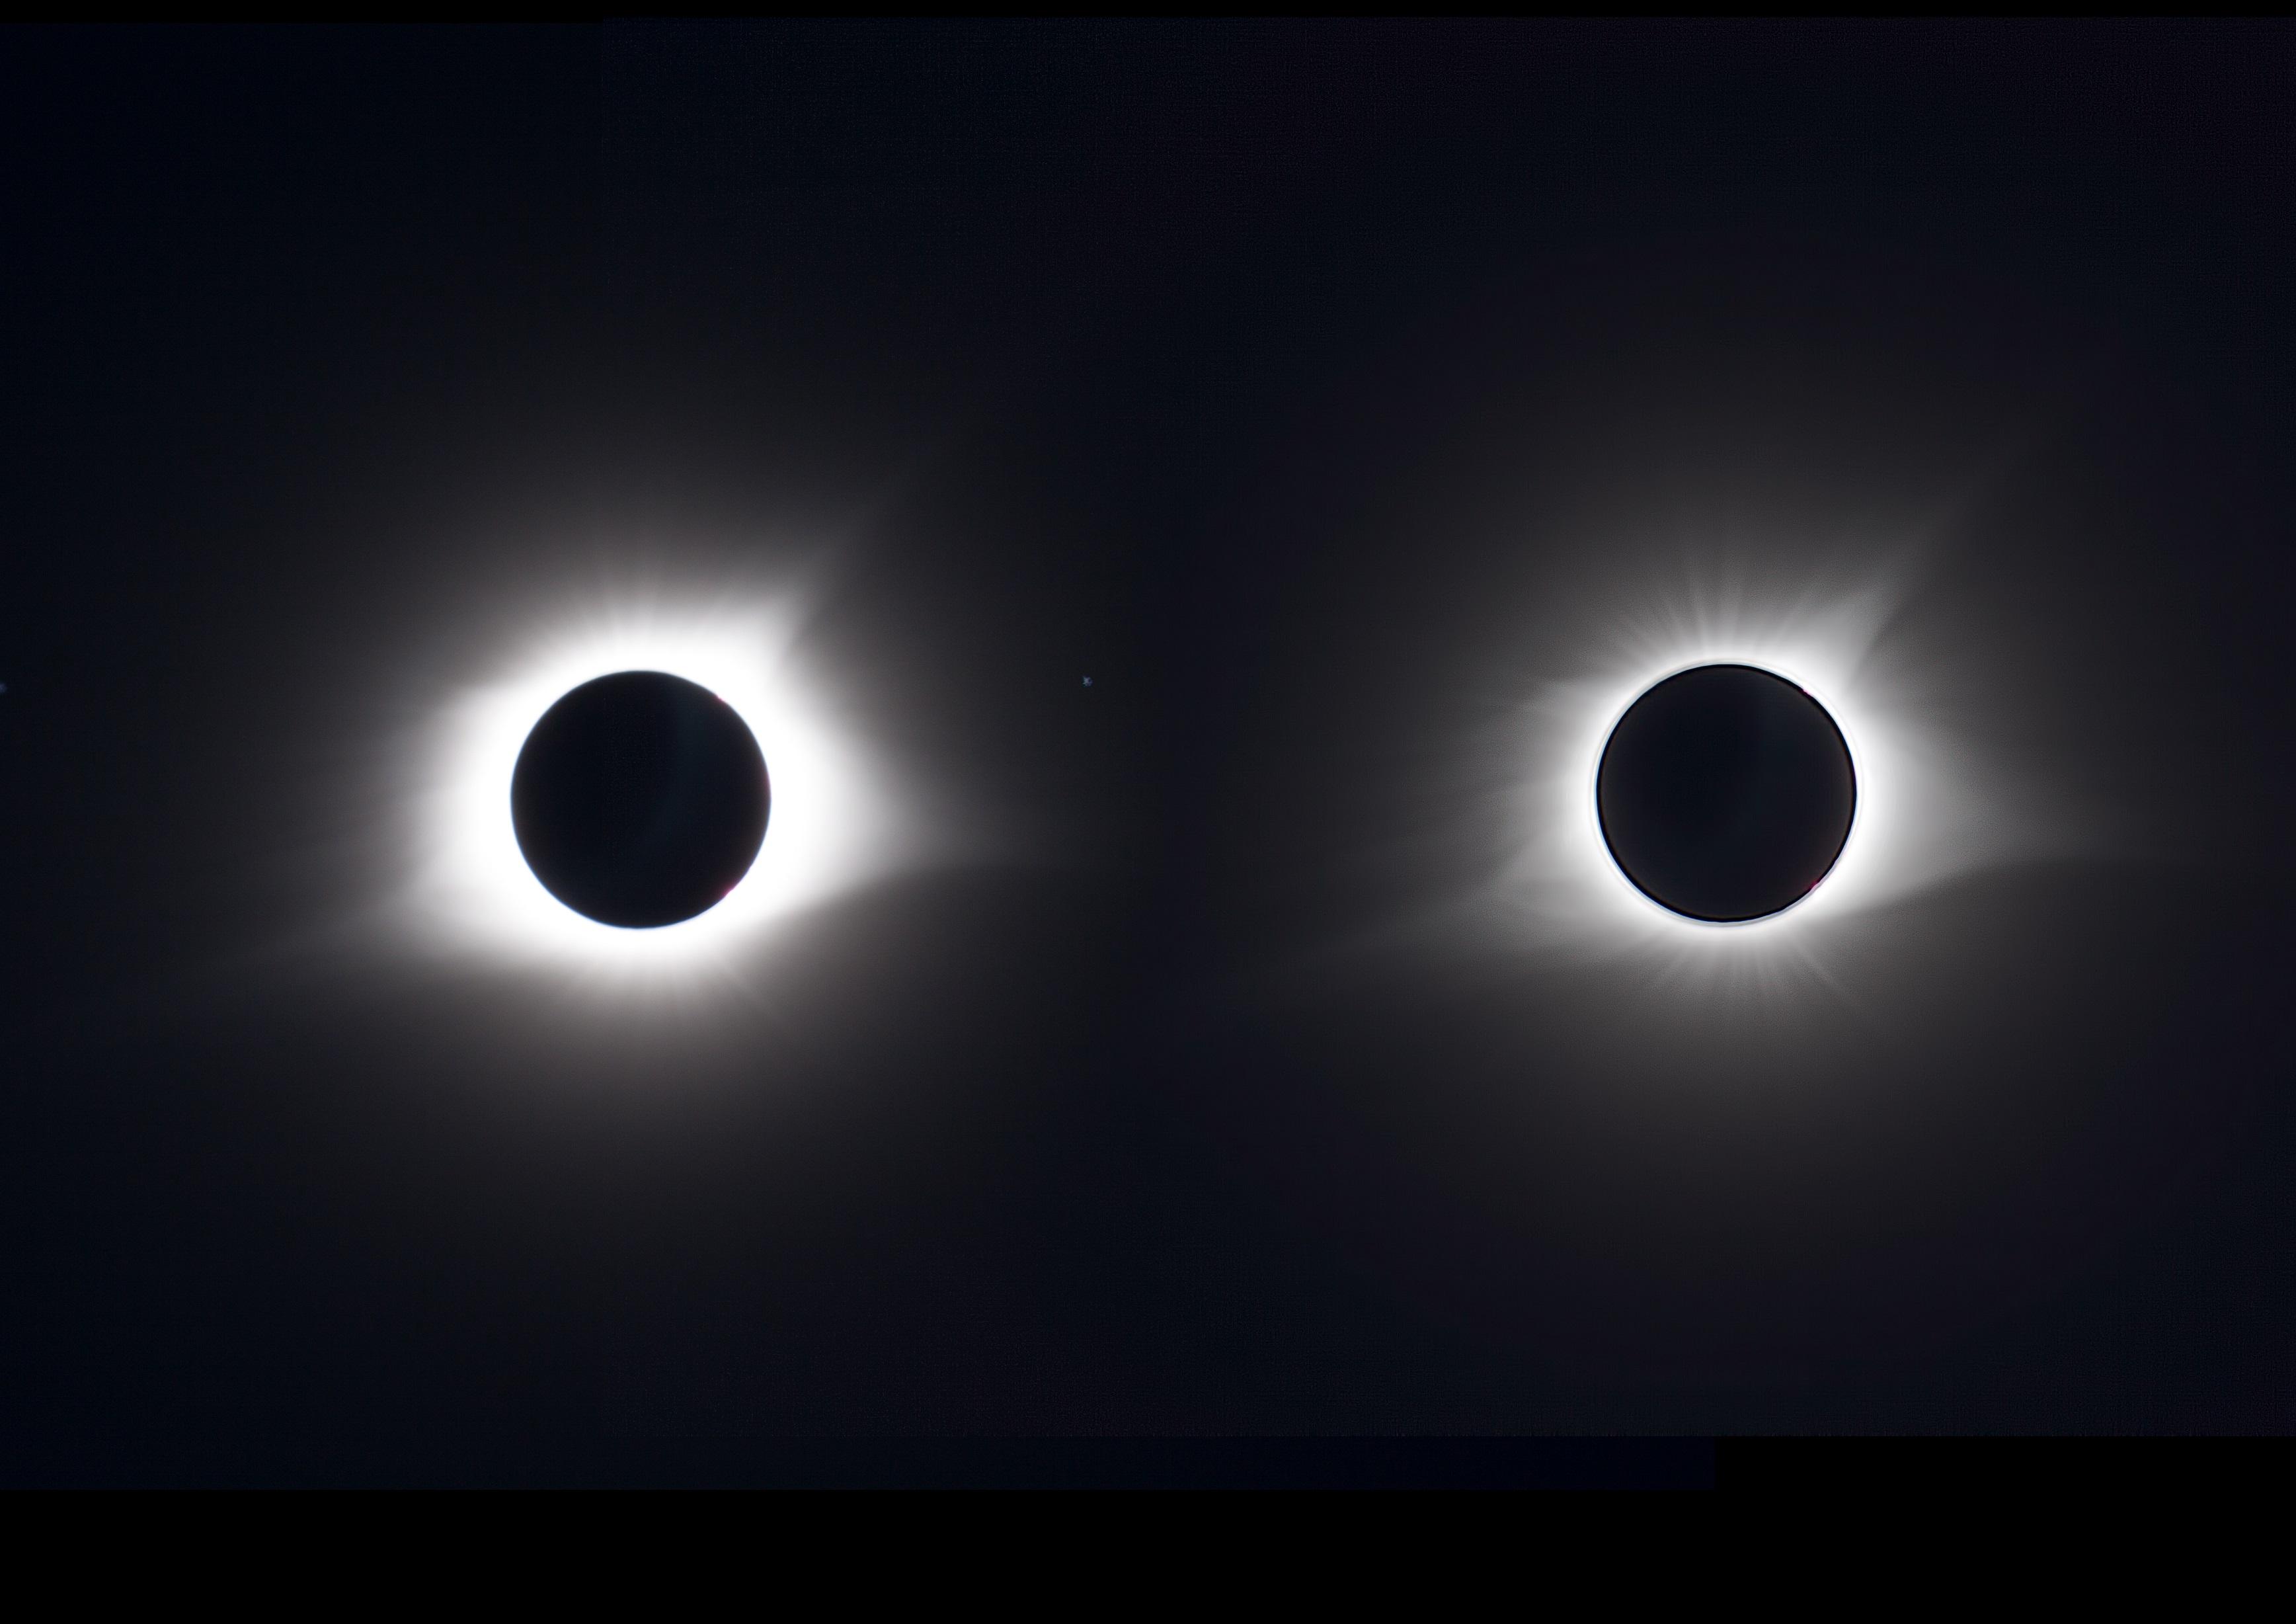 IMG_7763_7780 corona resize.jpg